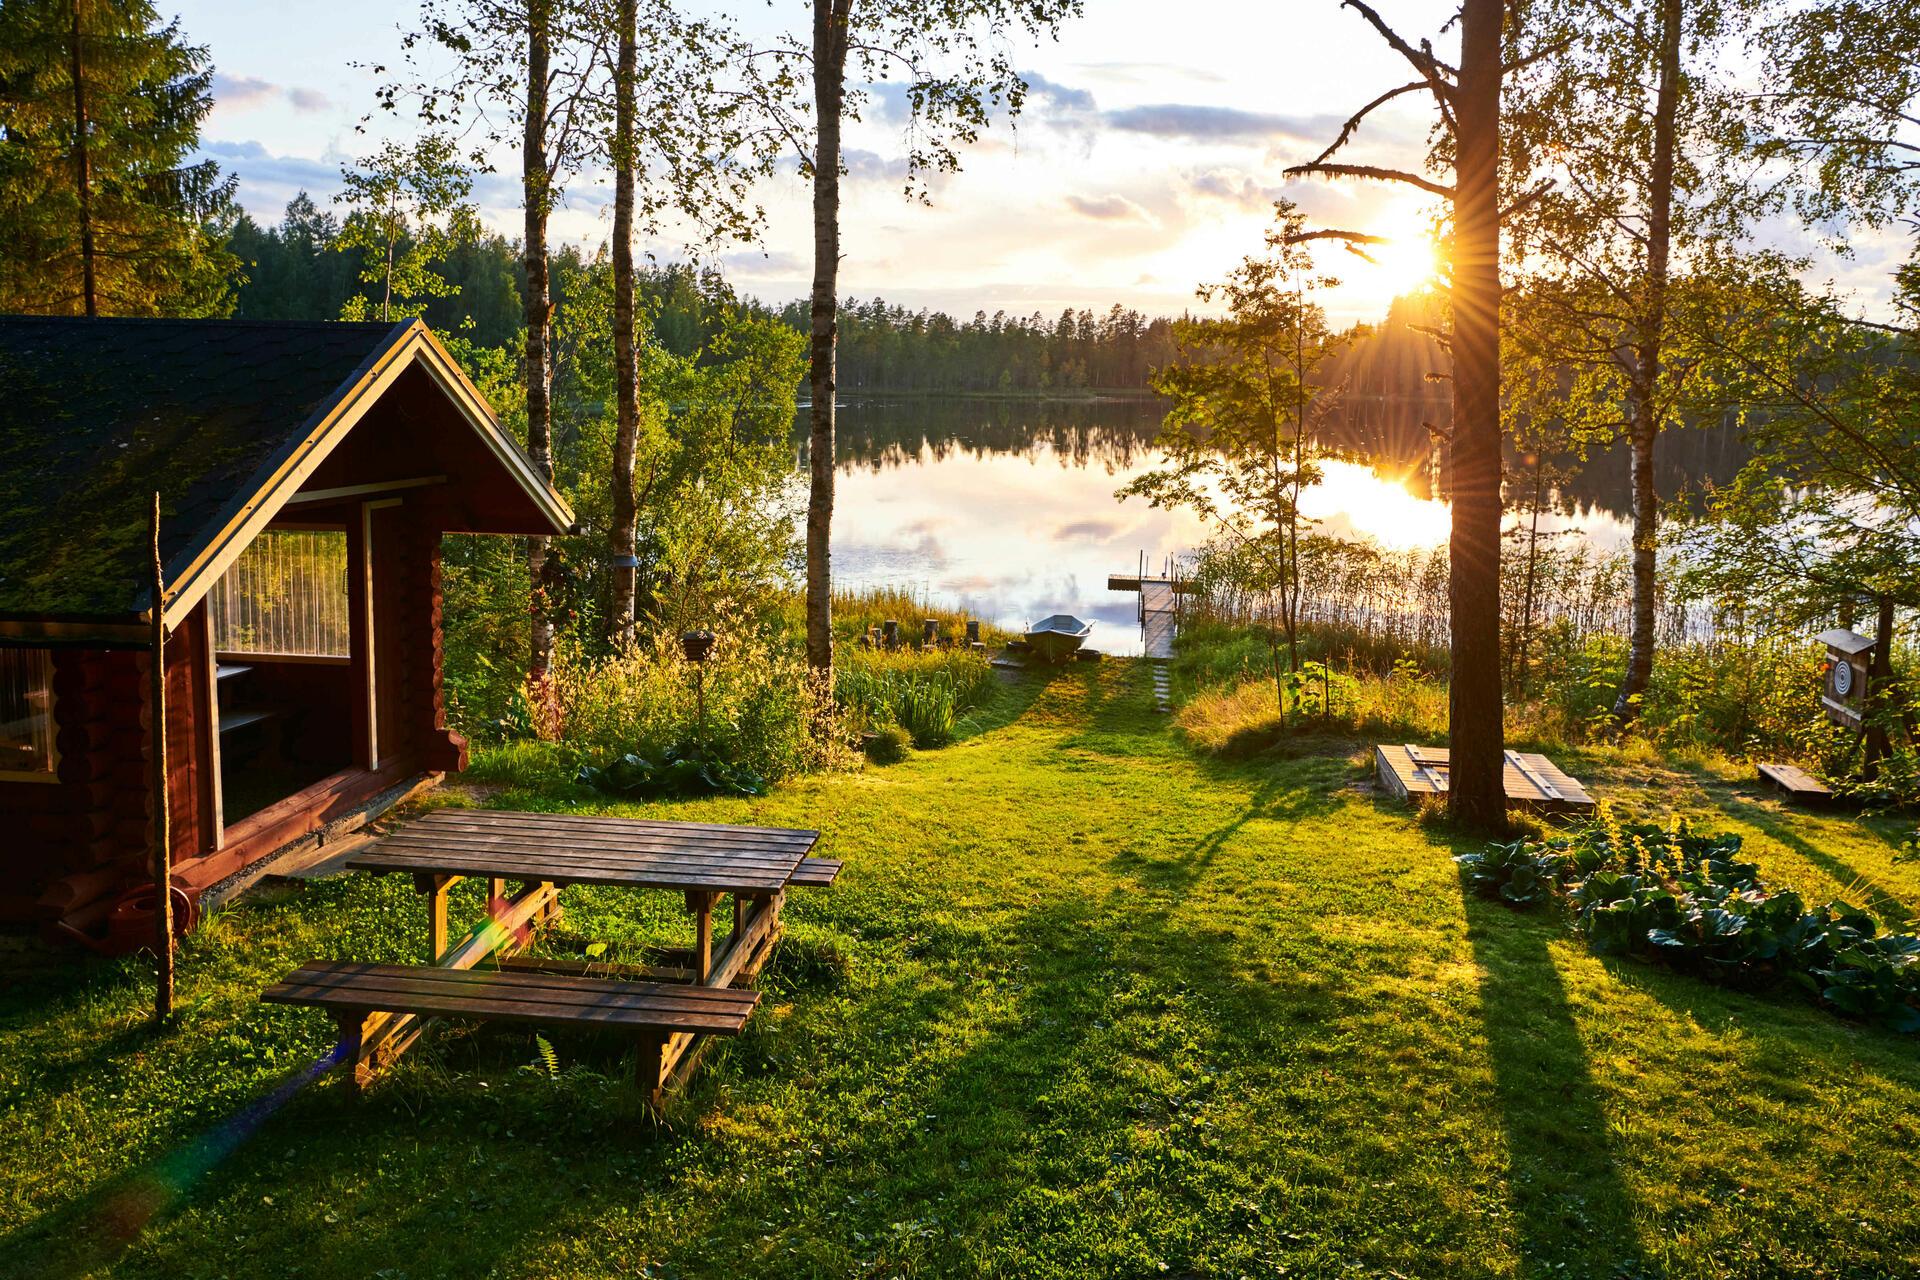 Northern Lights Village in Saariselkä, Lapland